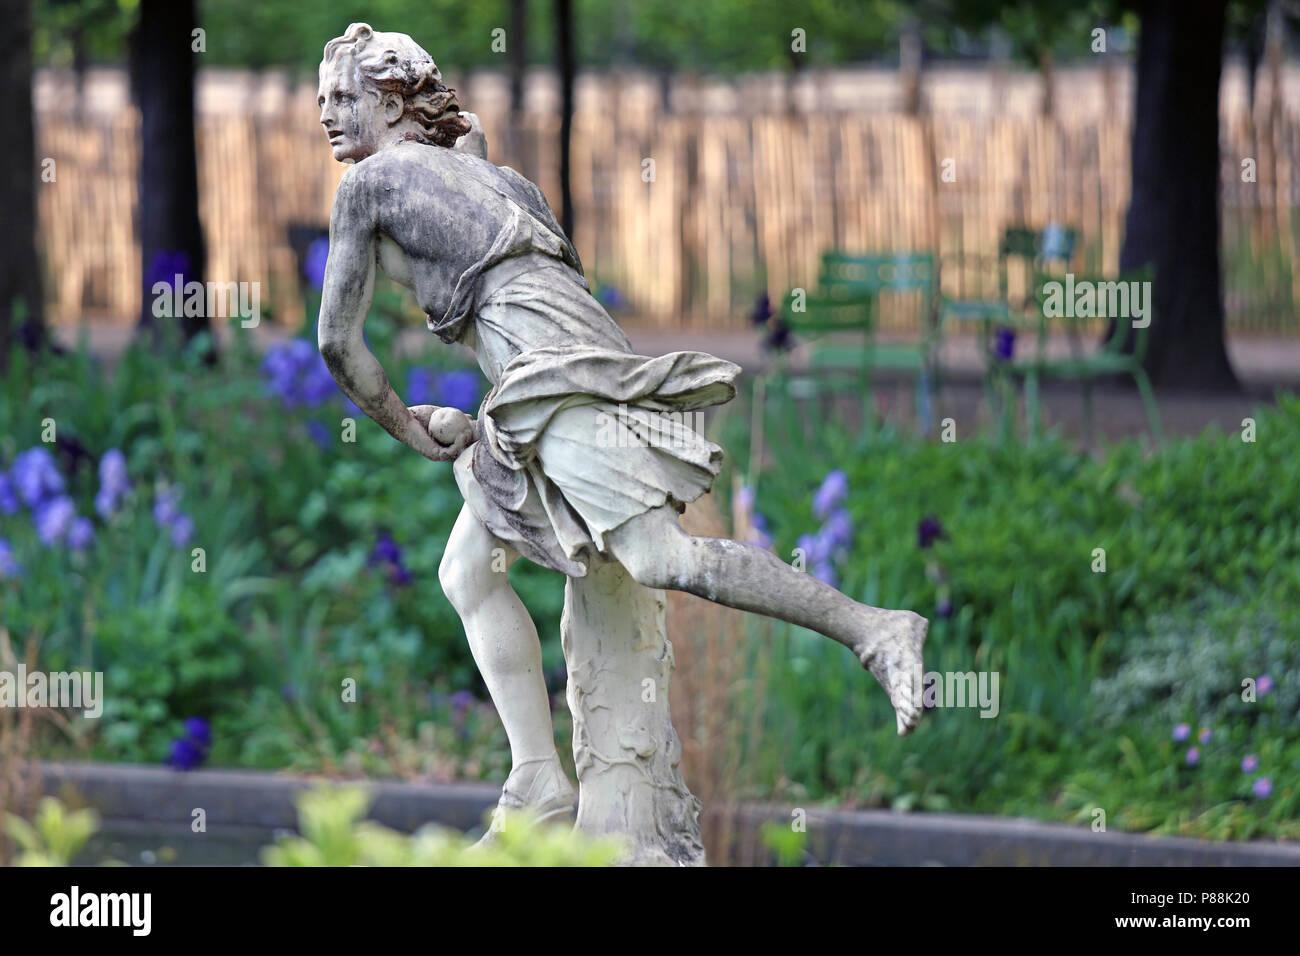 Sculpture of female in Tuileries Gardens, Paris, France, Europe - Stock Image